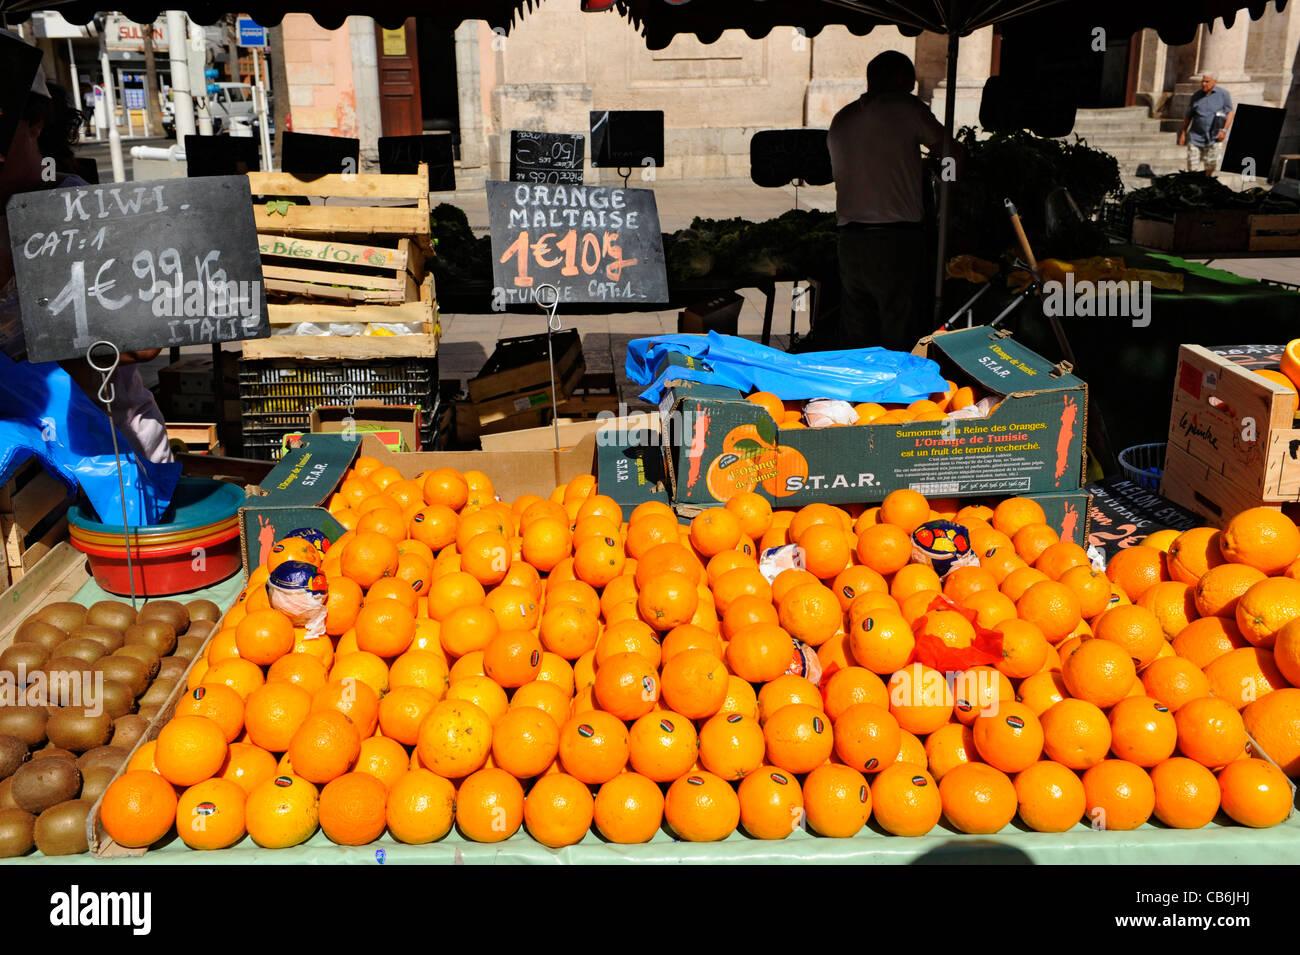 Oranges Display Market Toulon France French Riviera Mediterranean Europe Harbor Stock Photo